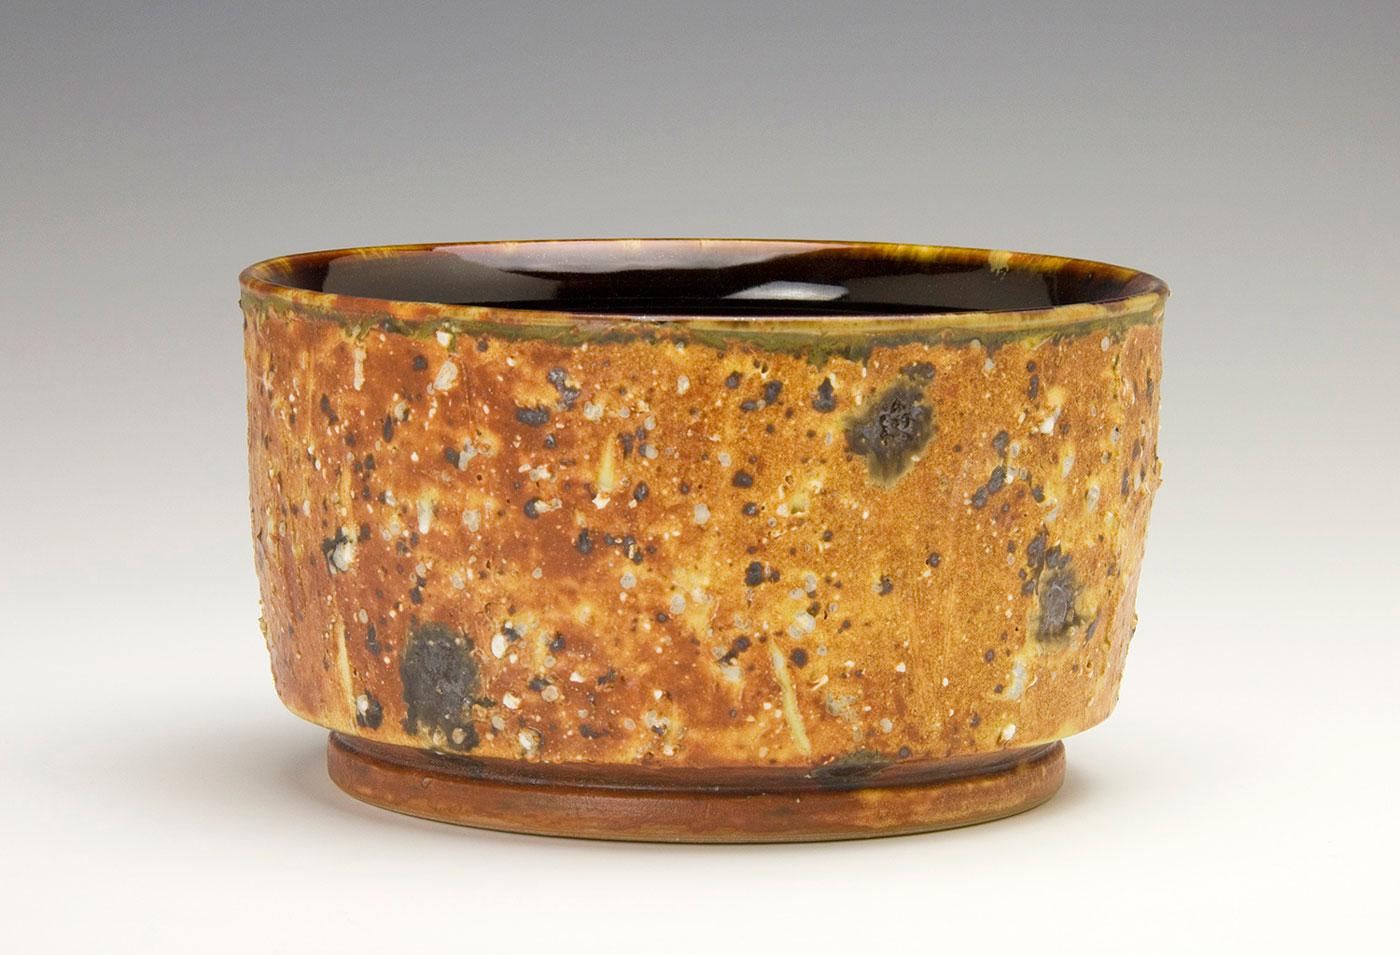 Studio-Pottery-Bowl-Wild-Clay-Bruce-Gholson-Seagrove.jpg